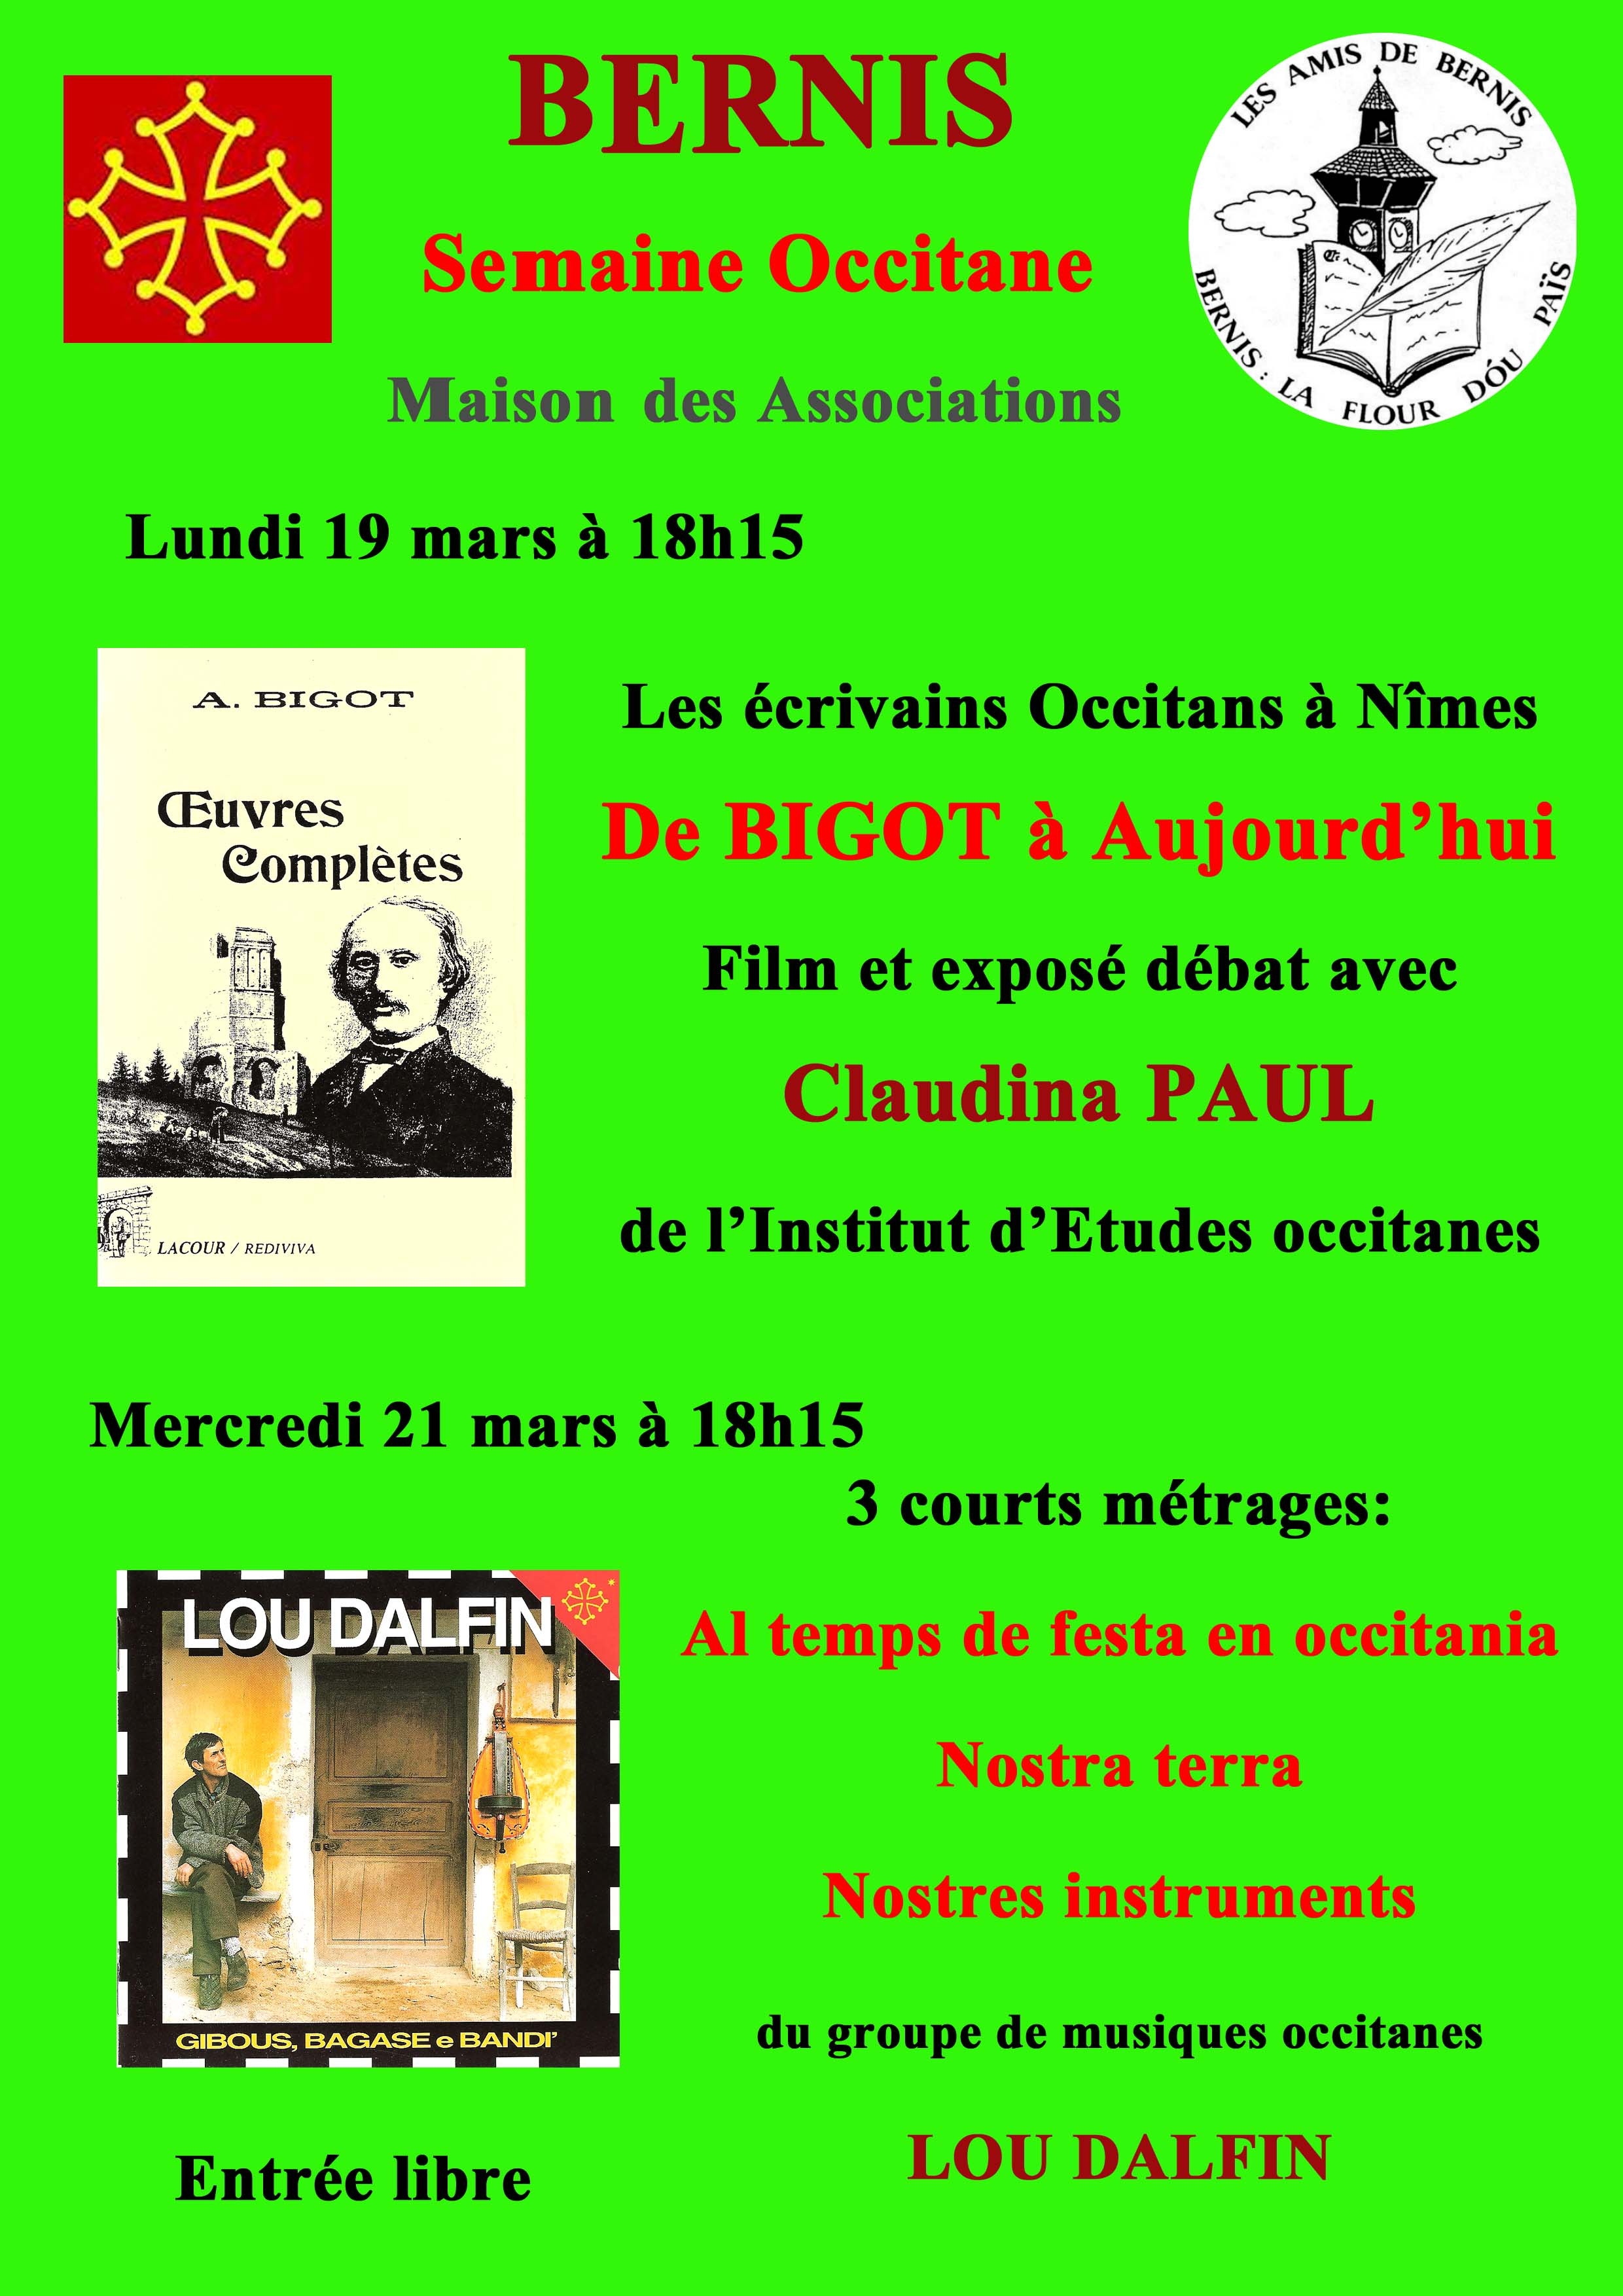 affiche semaine occitane copie.jpg